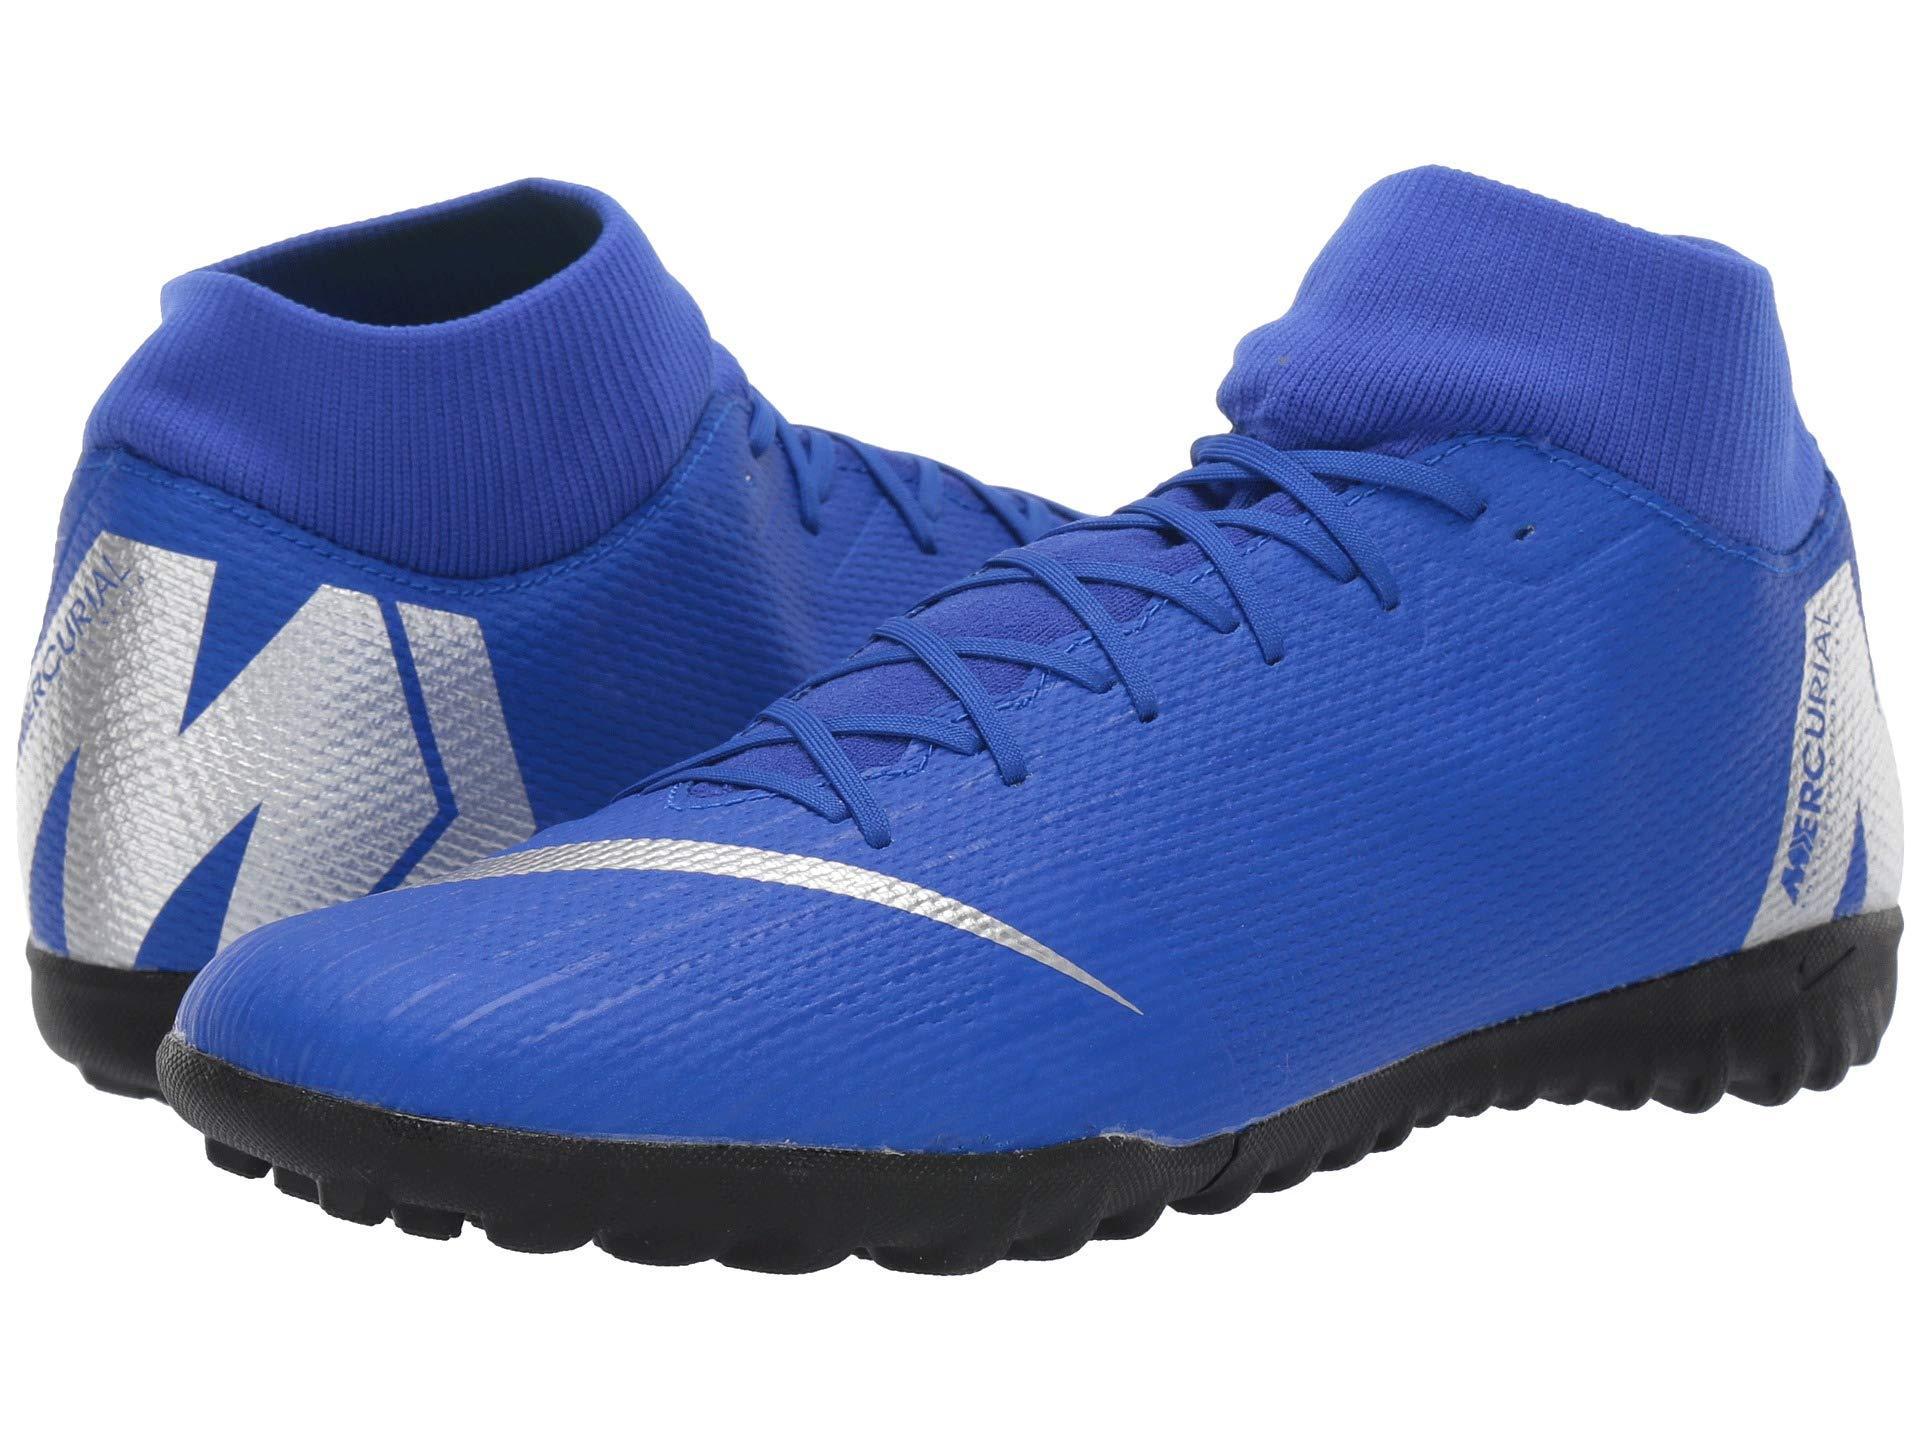 ec7d5dbce793 Nike Superflyx 6 Academy Tf in Blue for Men - Lyst